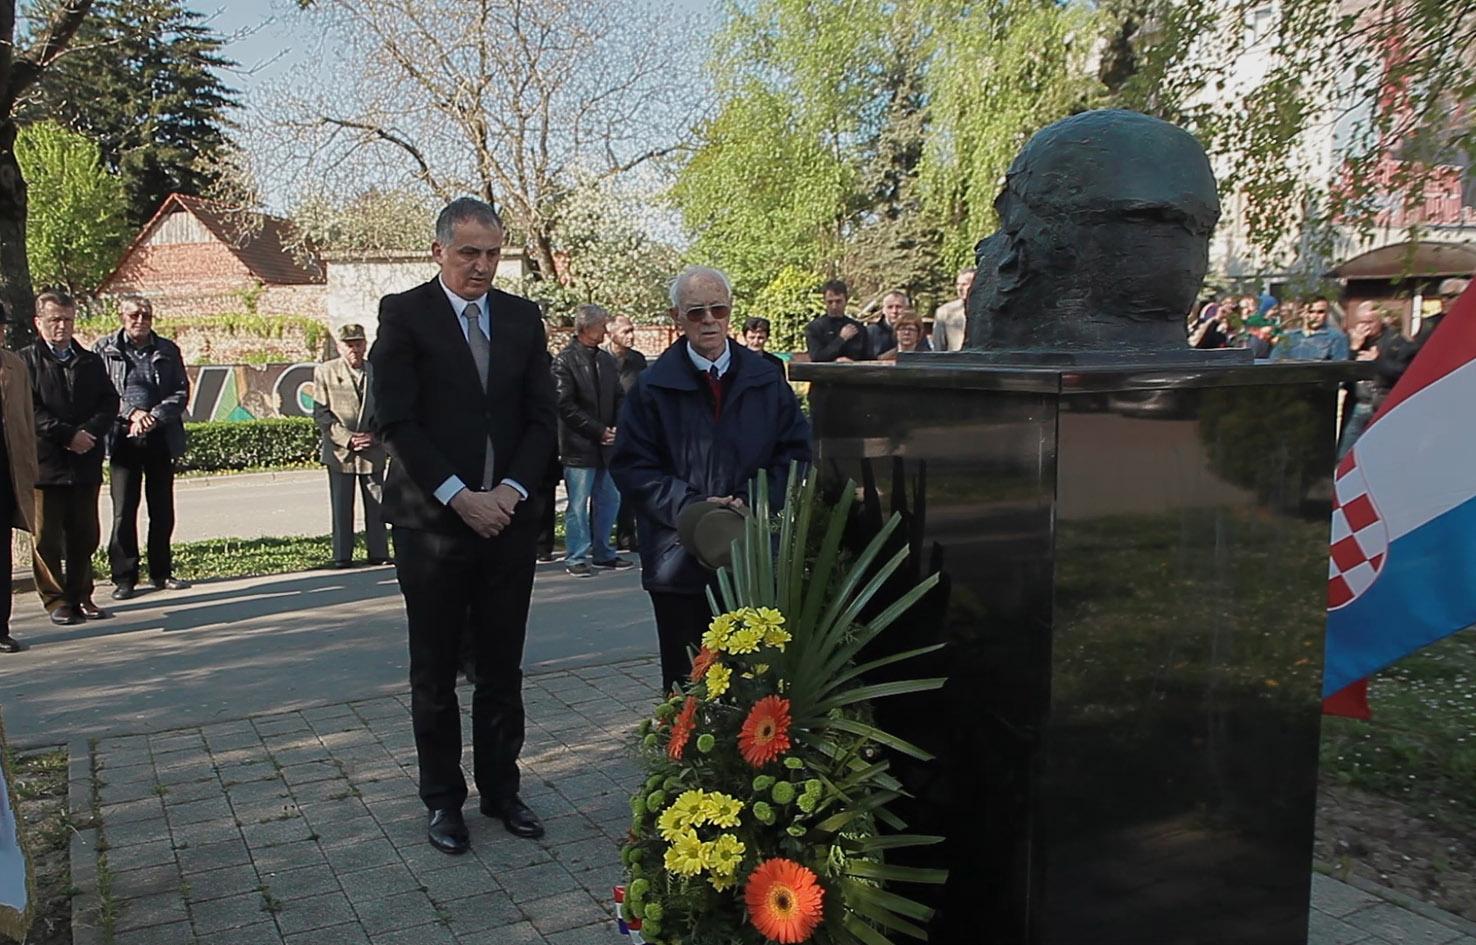 Polaganje vijenaca za žrtve partizanskih zločina